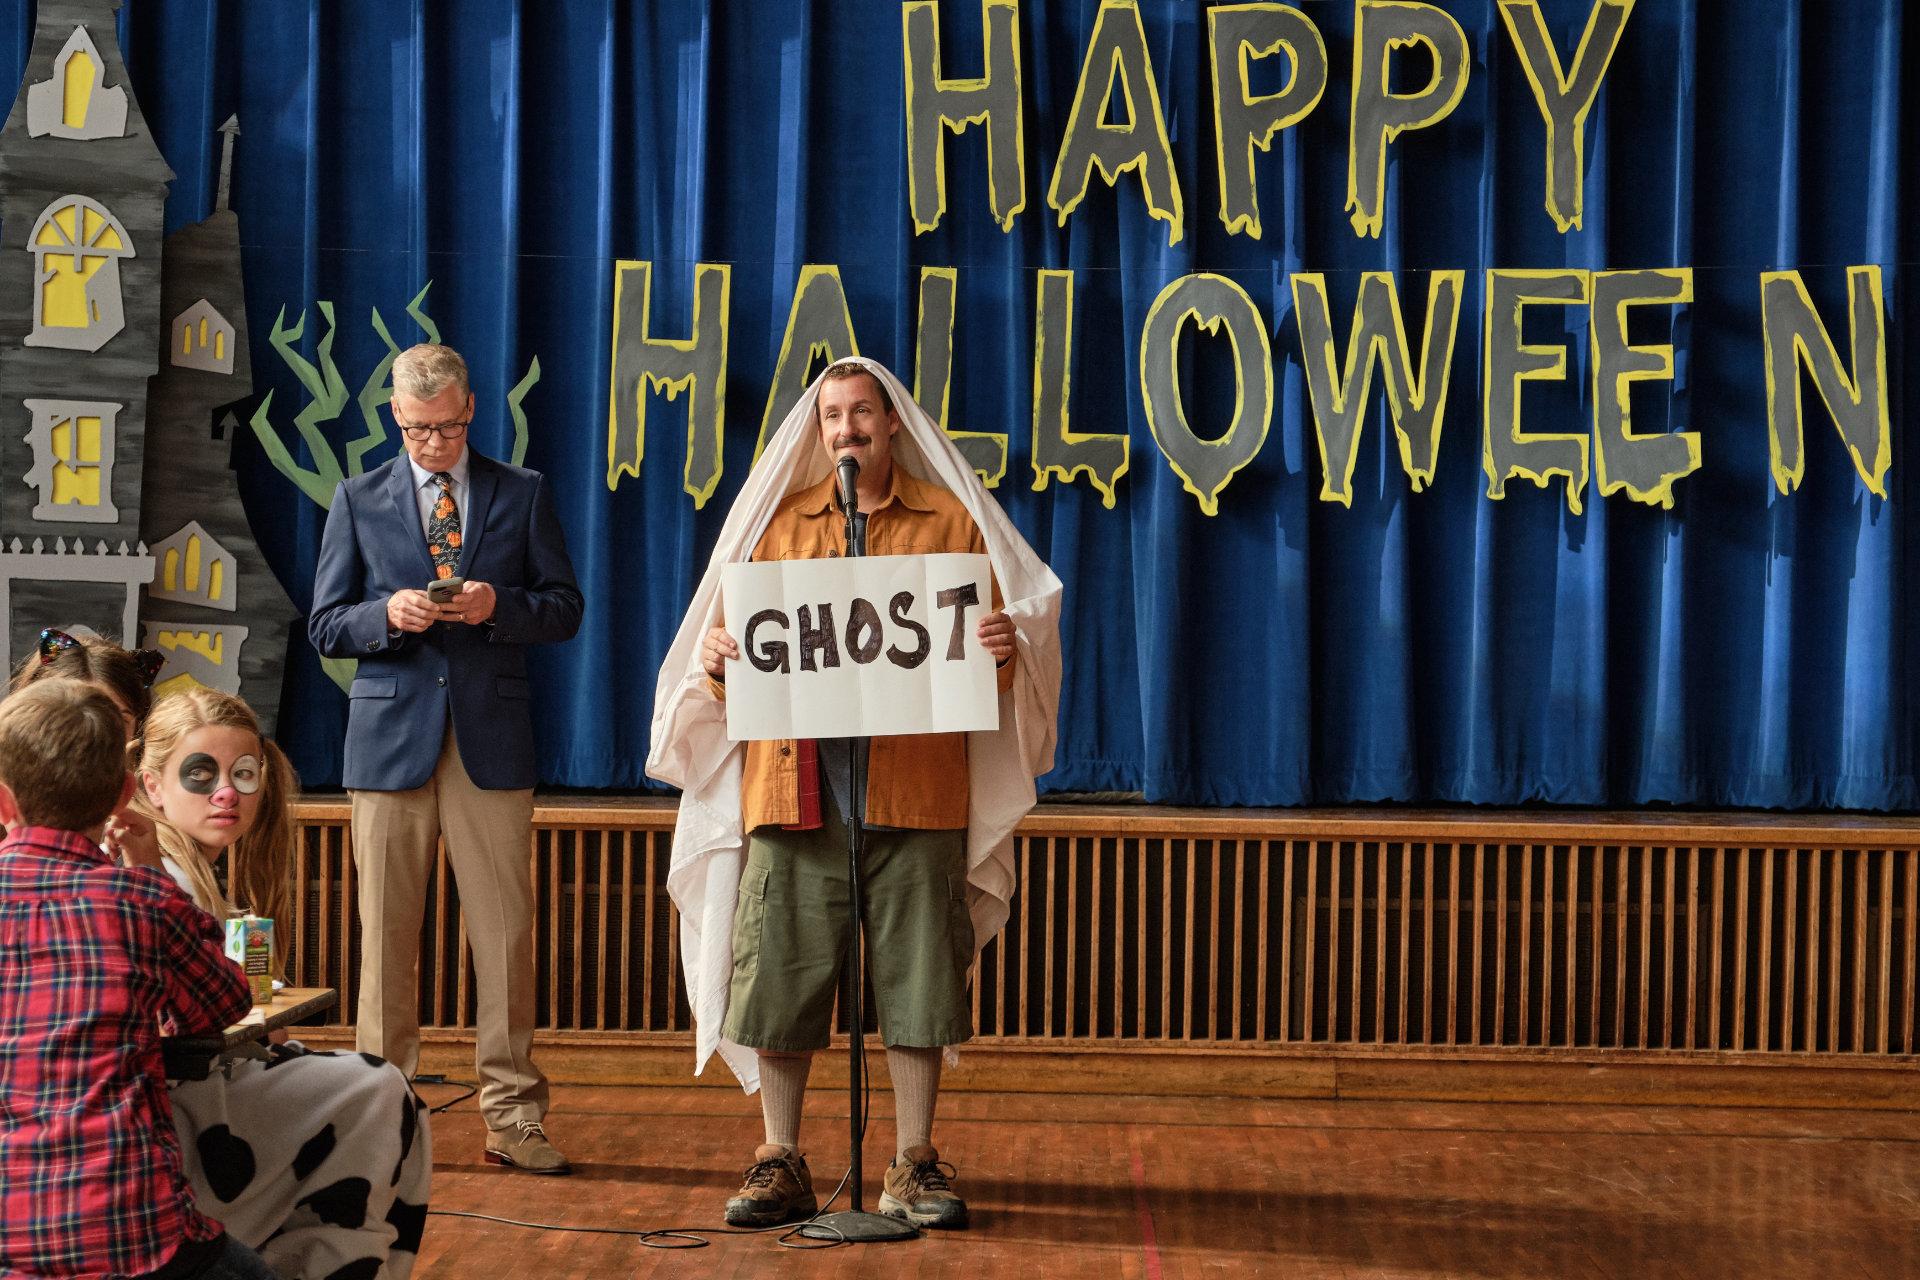 Adam Sandler Has A Hubie Halloween In This Marblehead Filmed Netflix Movie